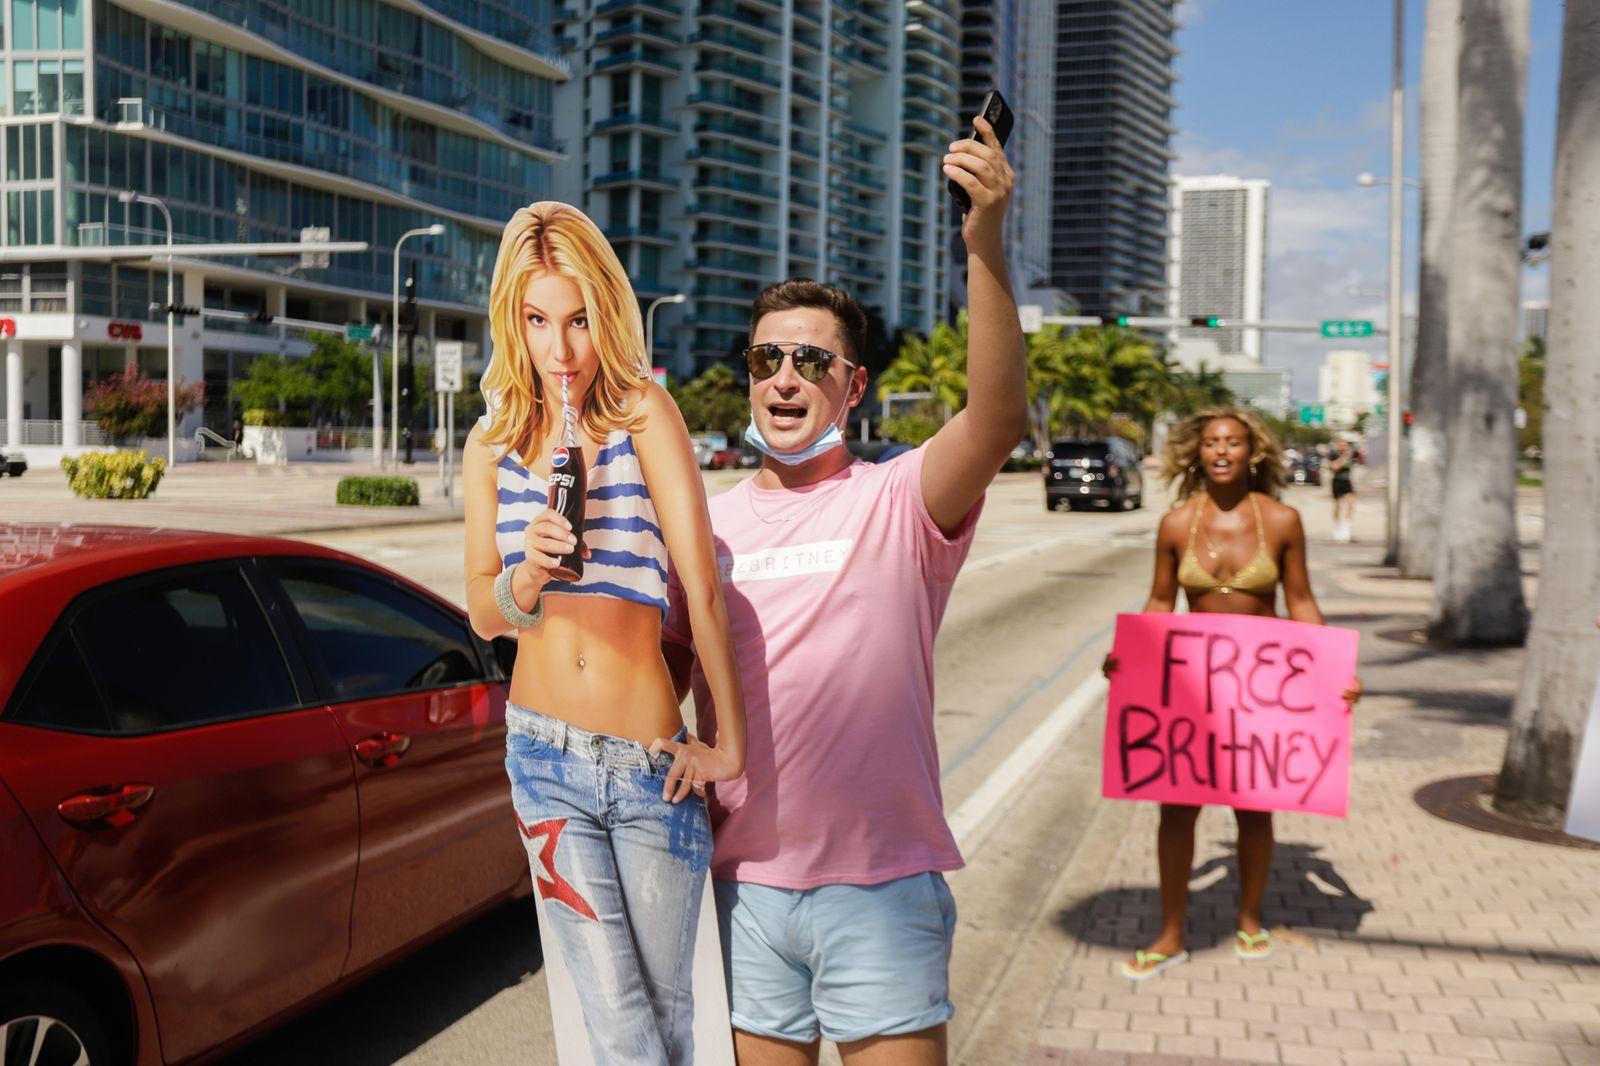 #FreeBritney Miami Rally